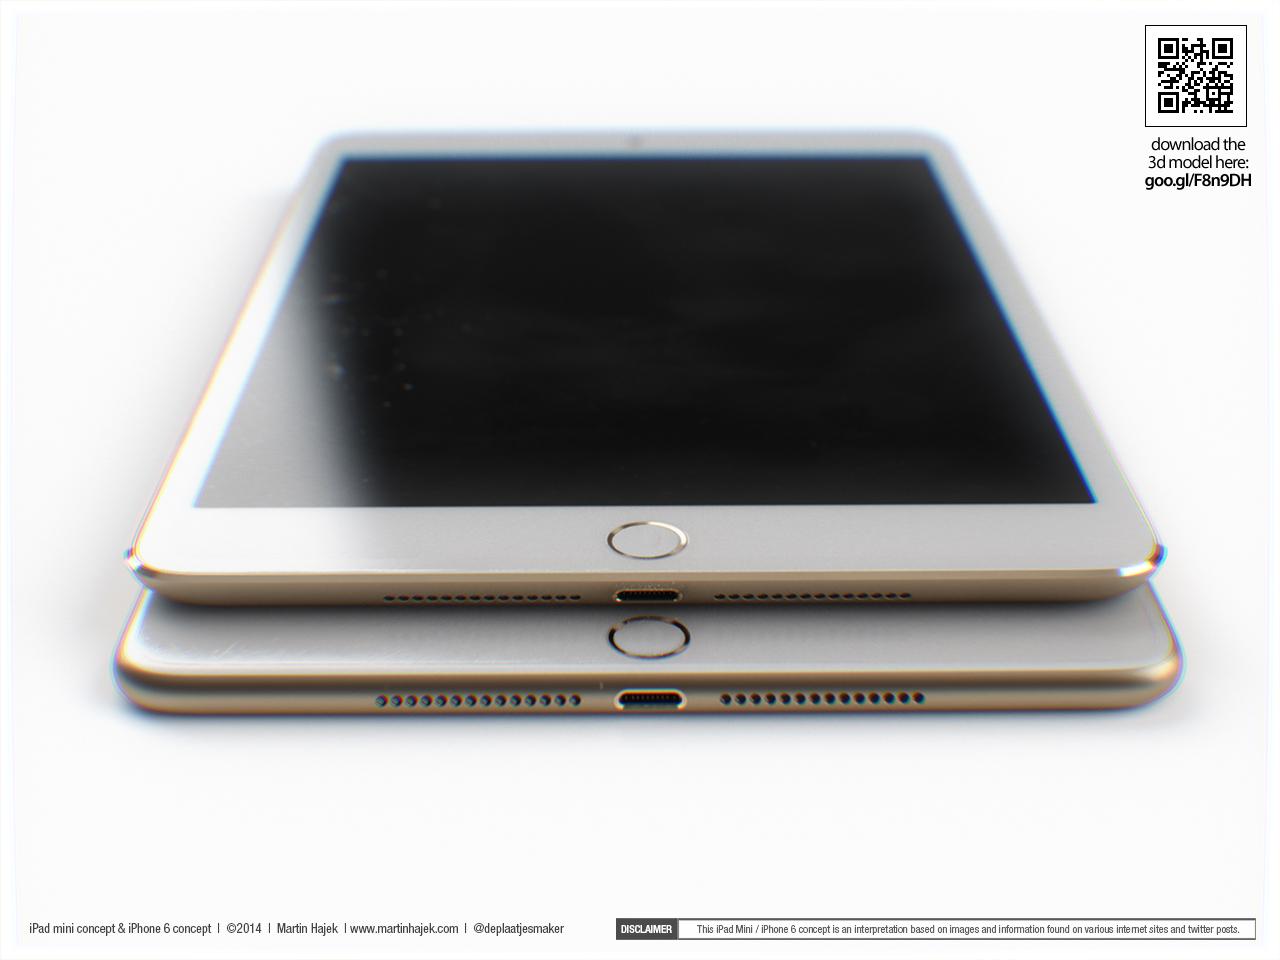 Conceito de iPad mini (por Marin Hajek)